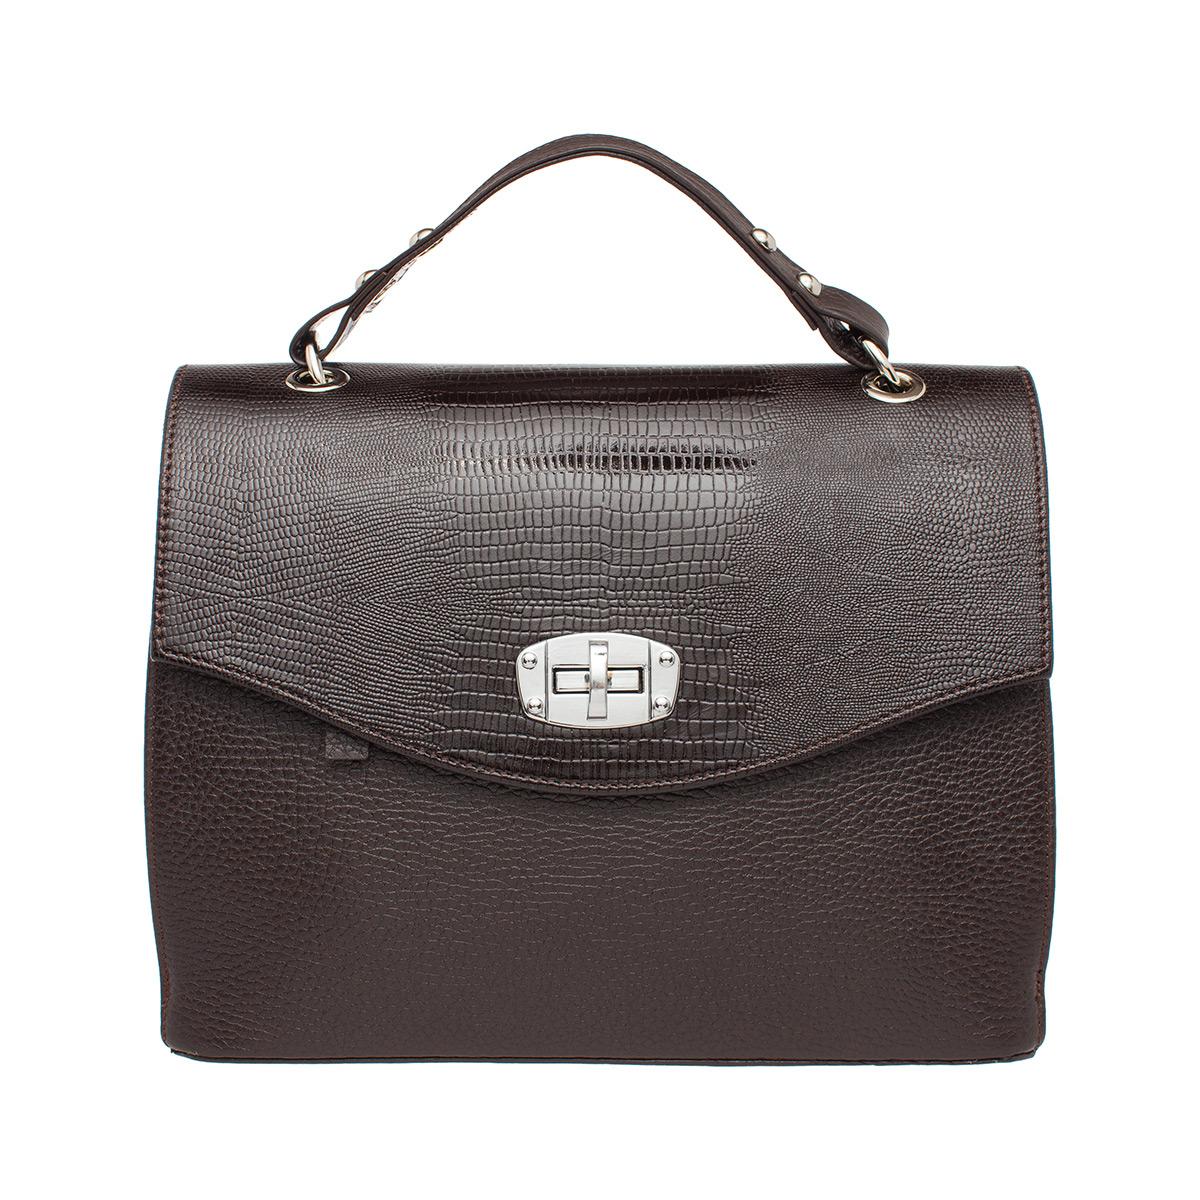 Женская сумка Alison Brown фото